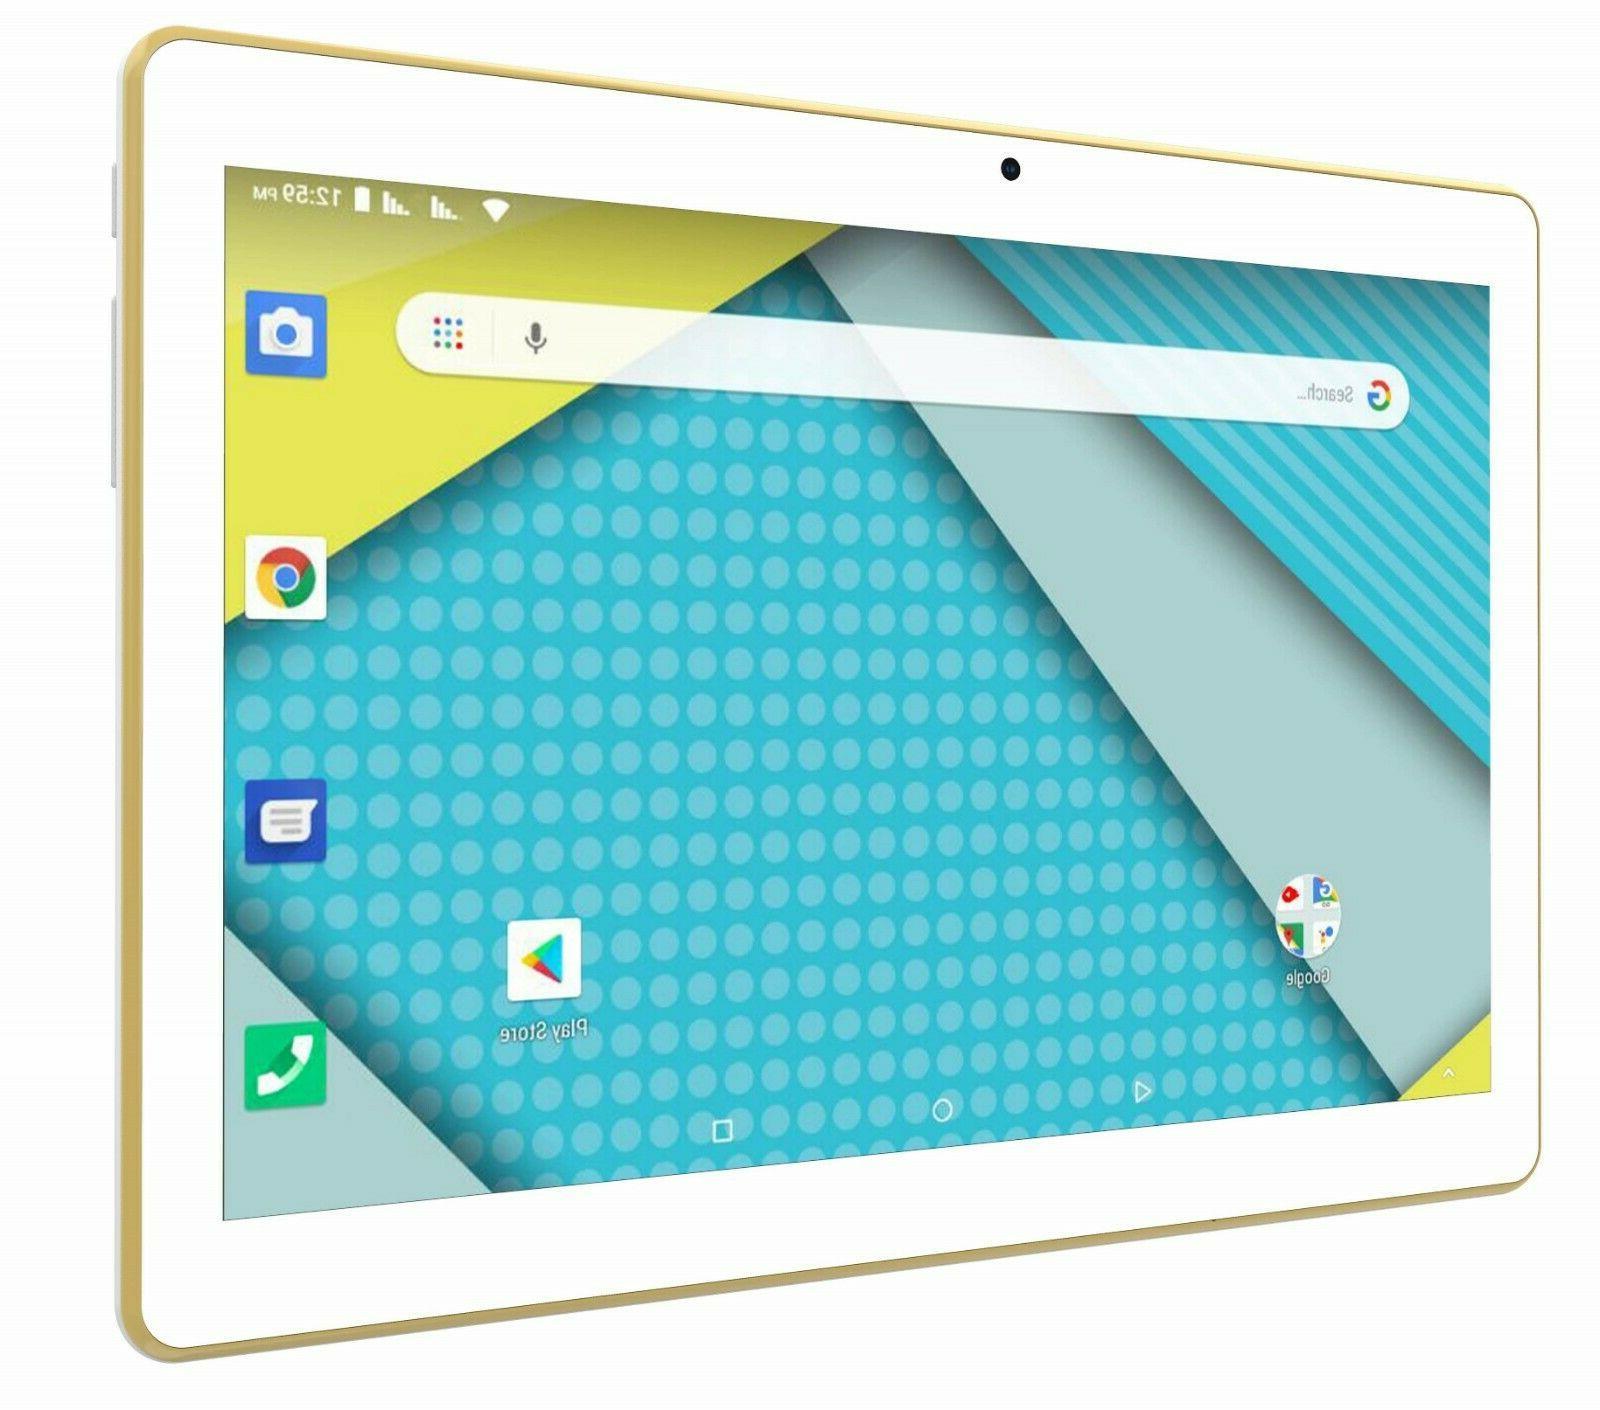 unlocked tablet phone phablet 10 1 display